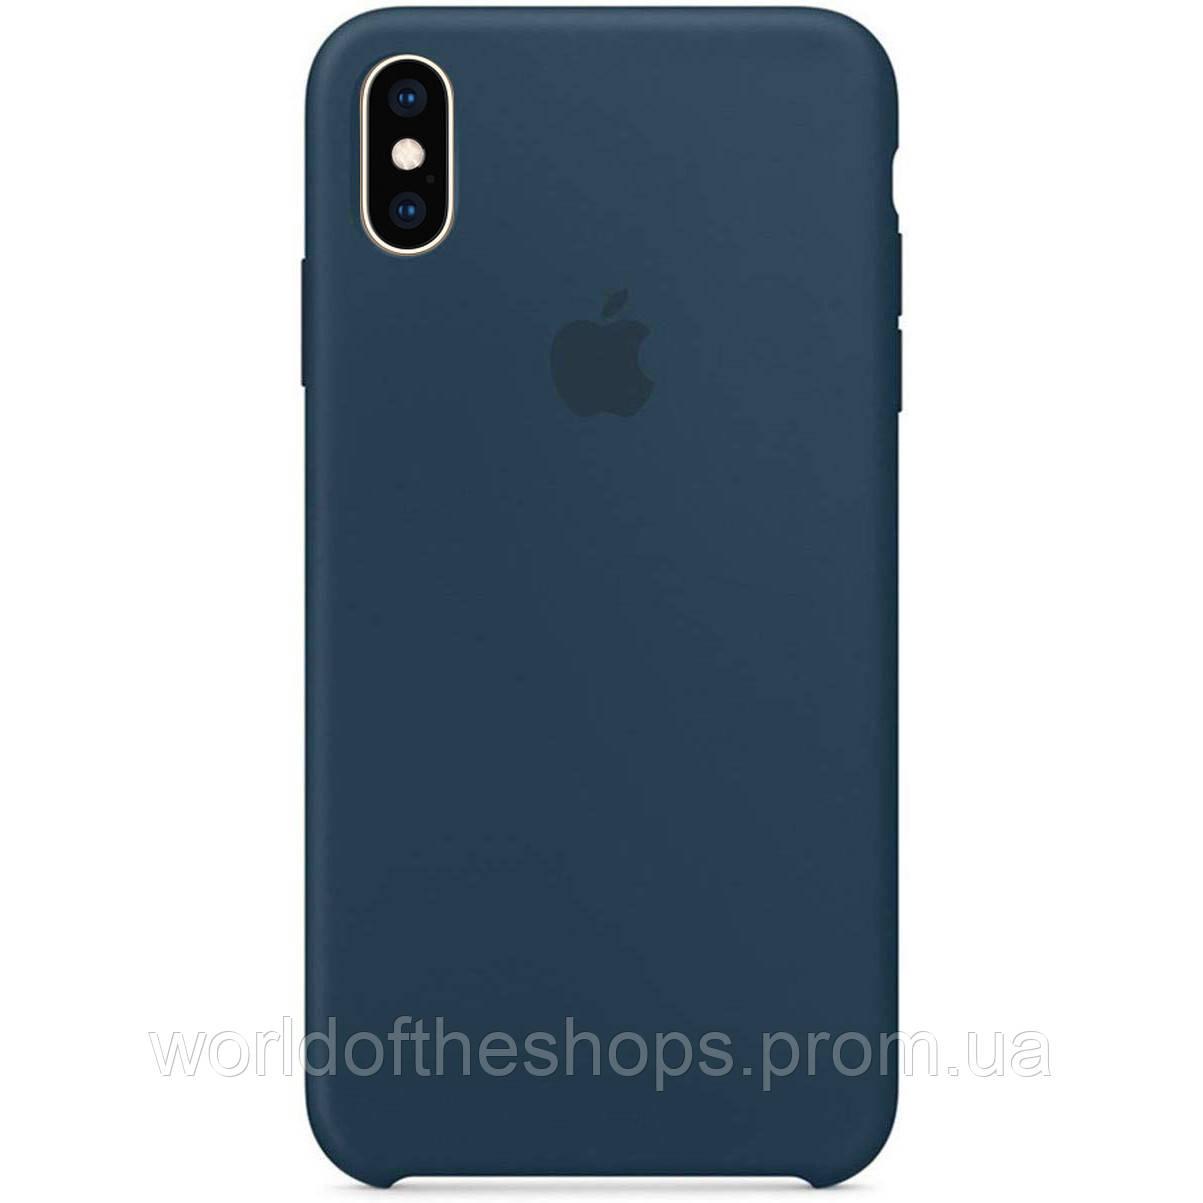 "Чехол Silicone Case (AA) для Apple iPhone X (5.8"") / XS (5.8""), Зеленый / pacific green"